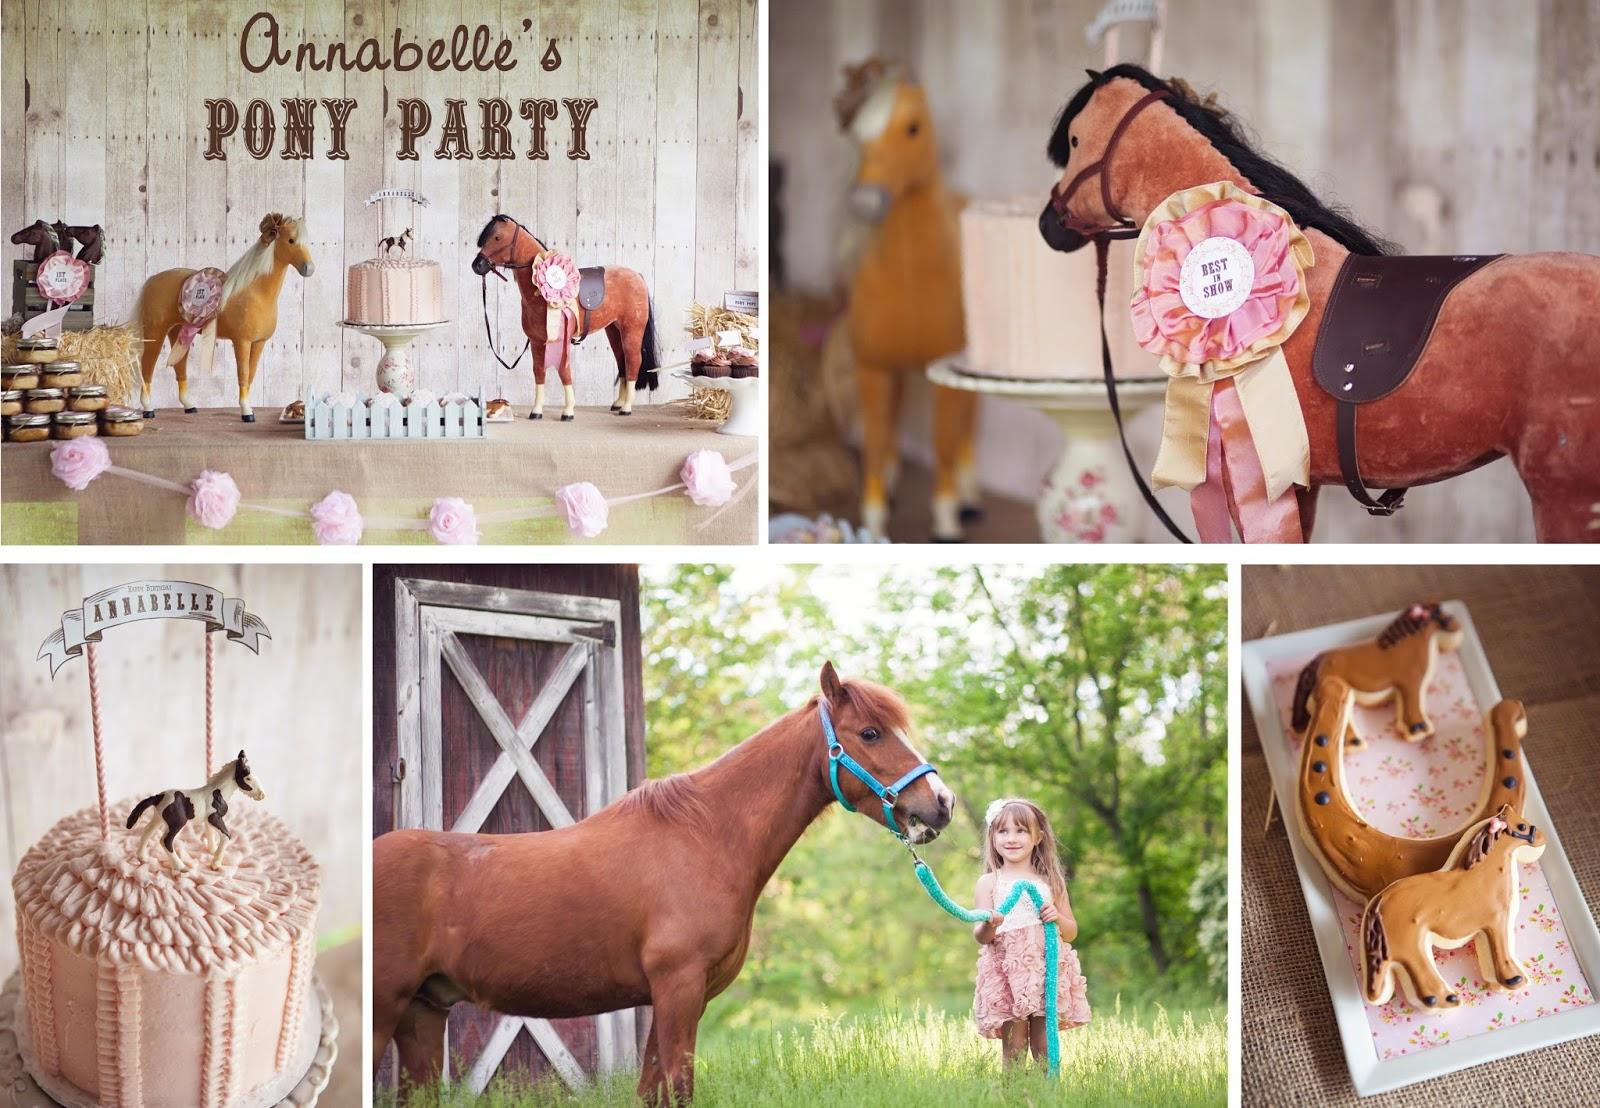 The Homespun Hostess: PONY PARTY celebrating Annabelle's ...